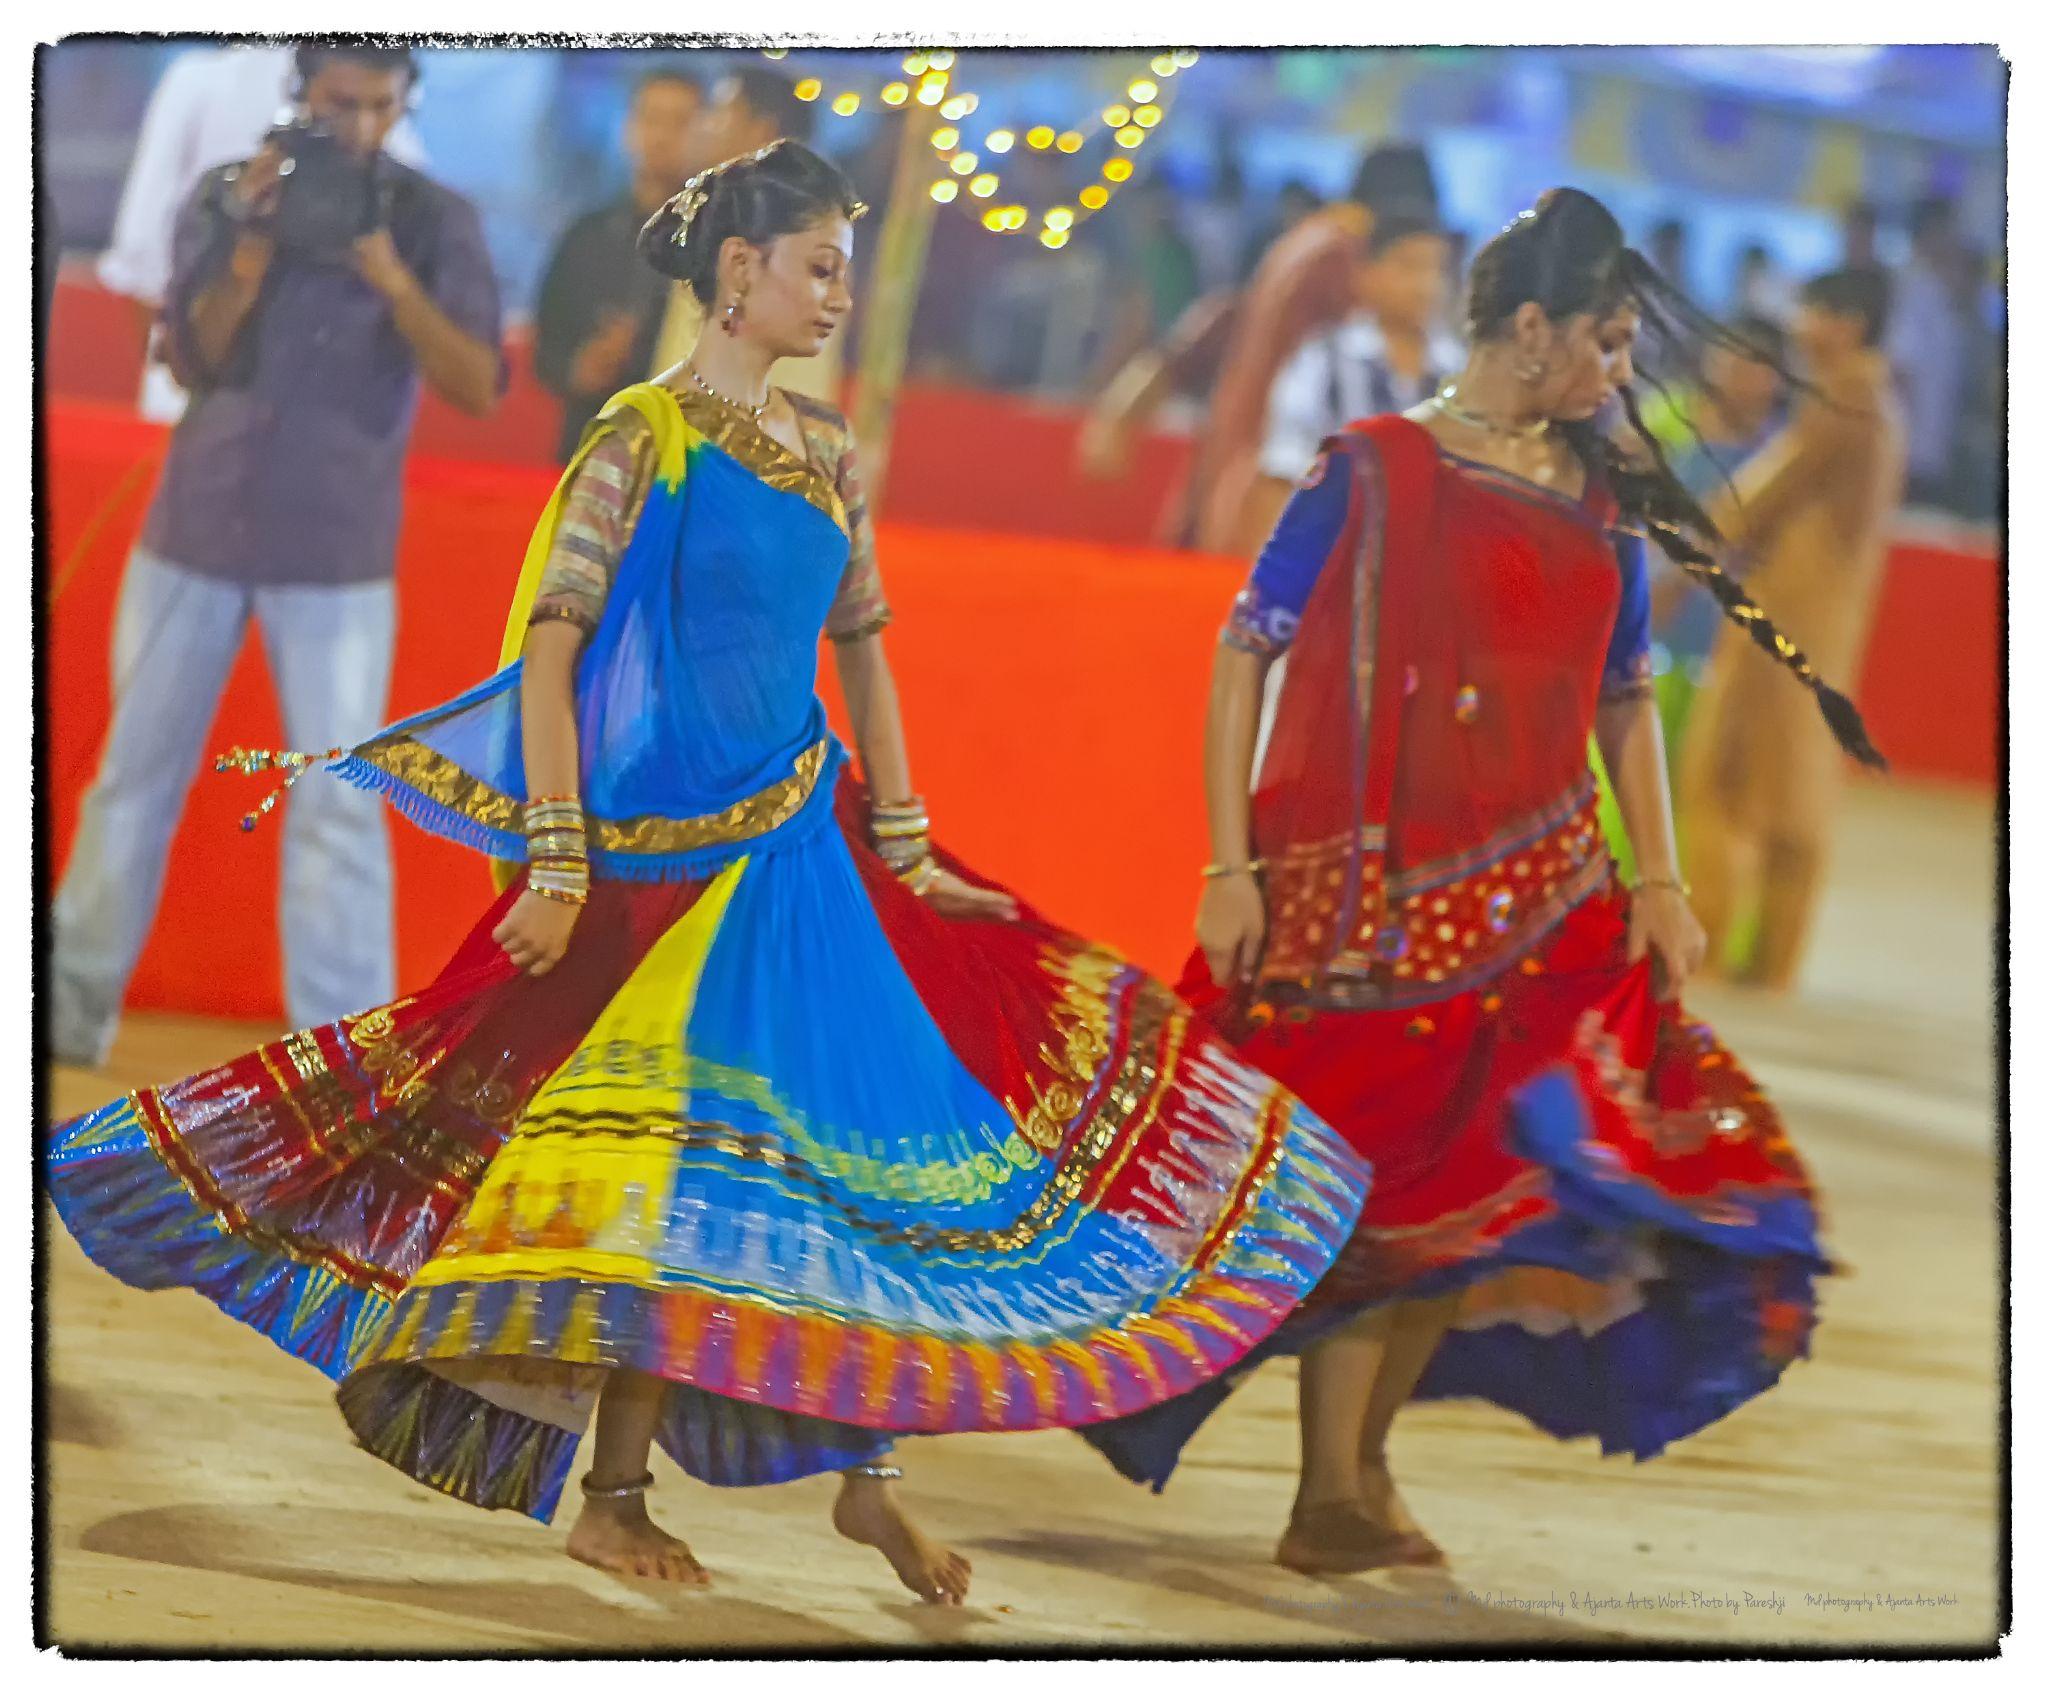 Garba dancers by Wow! Photos.Eu